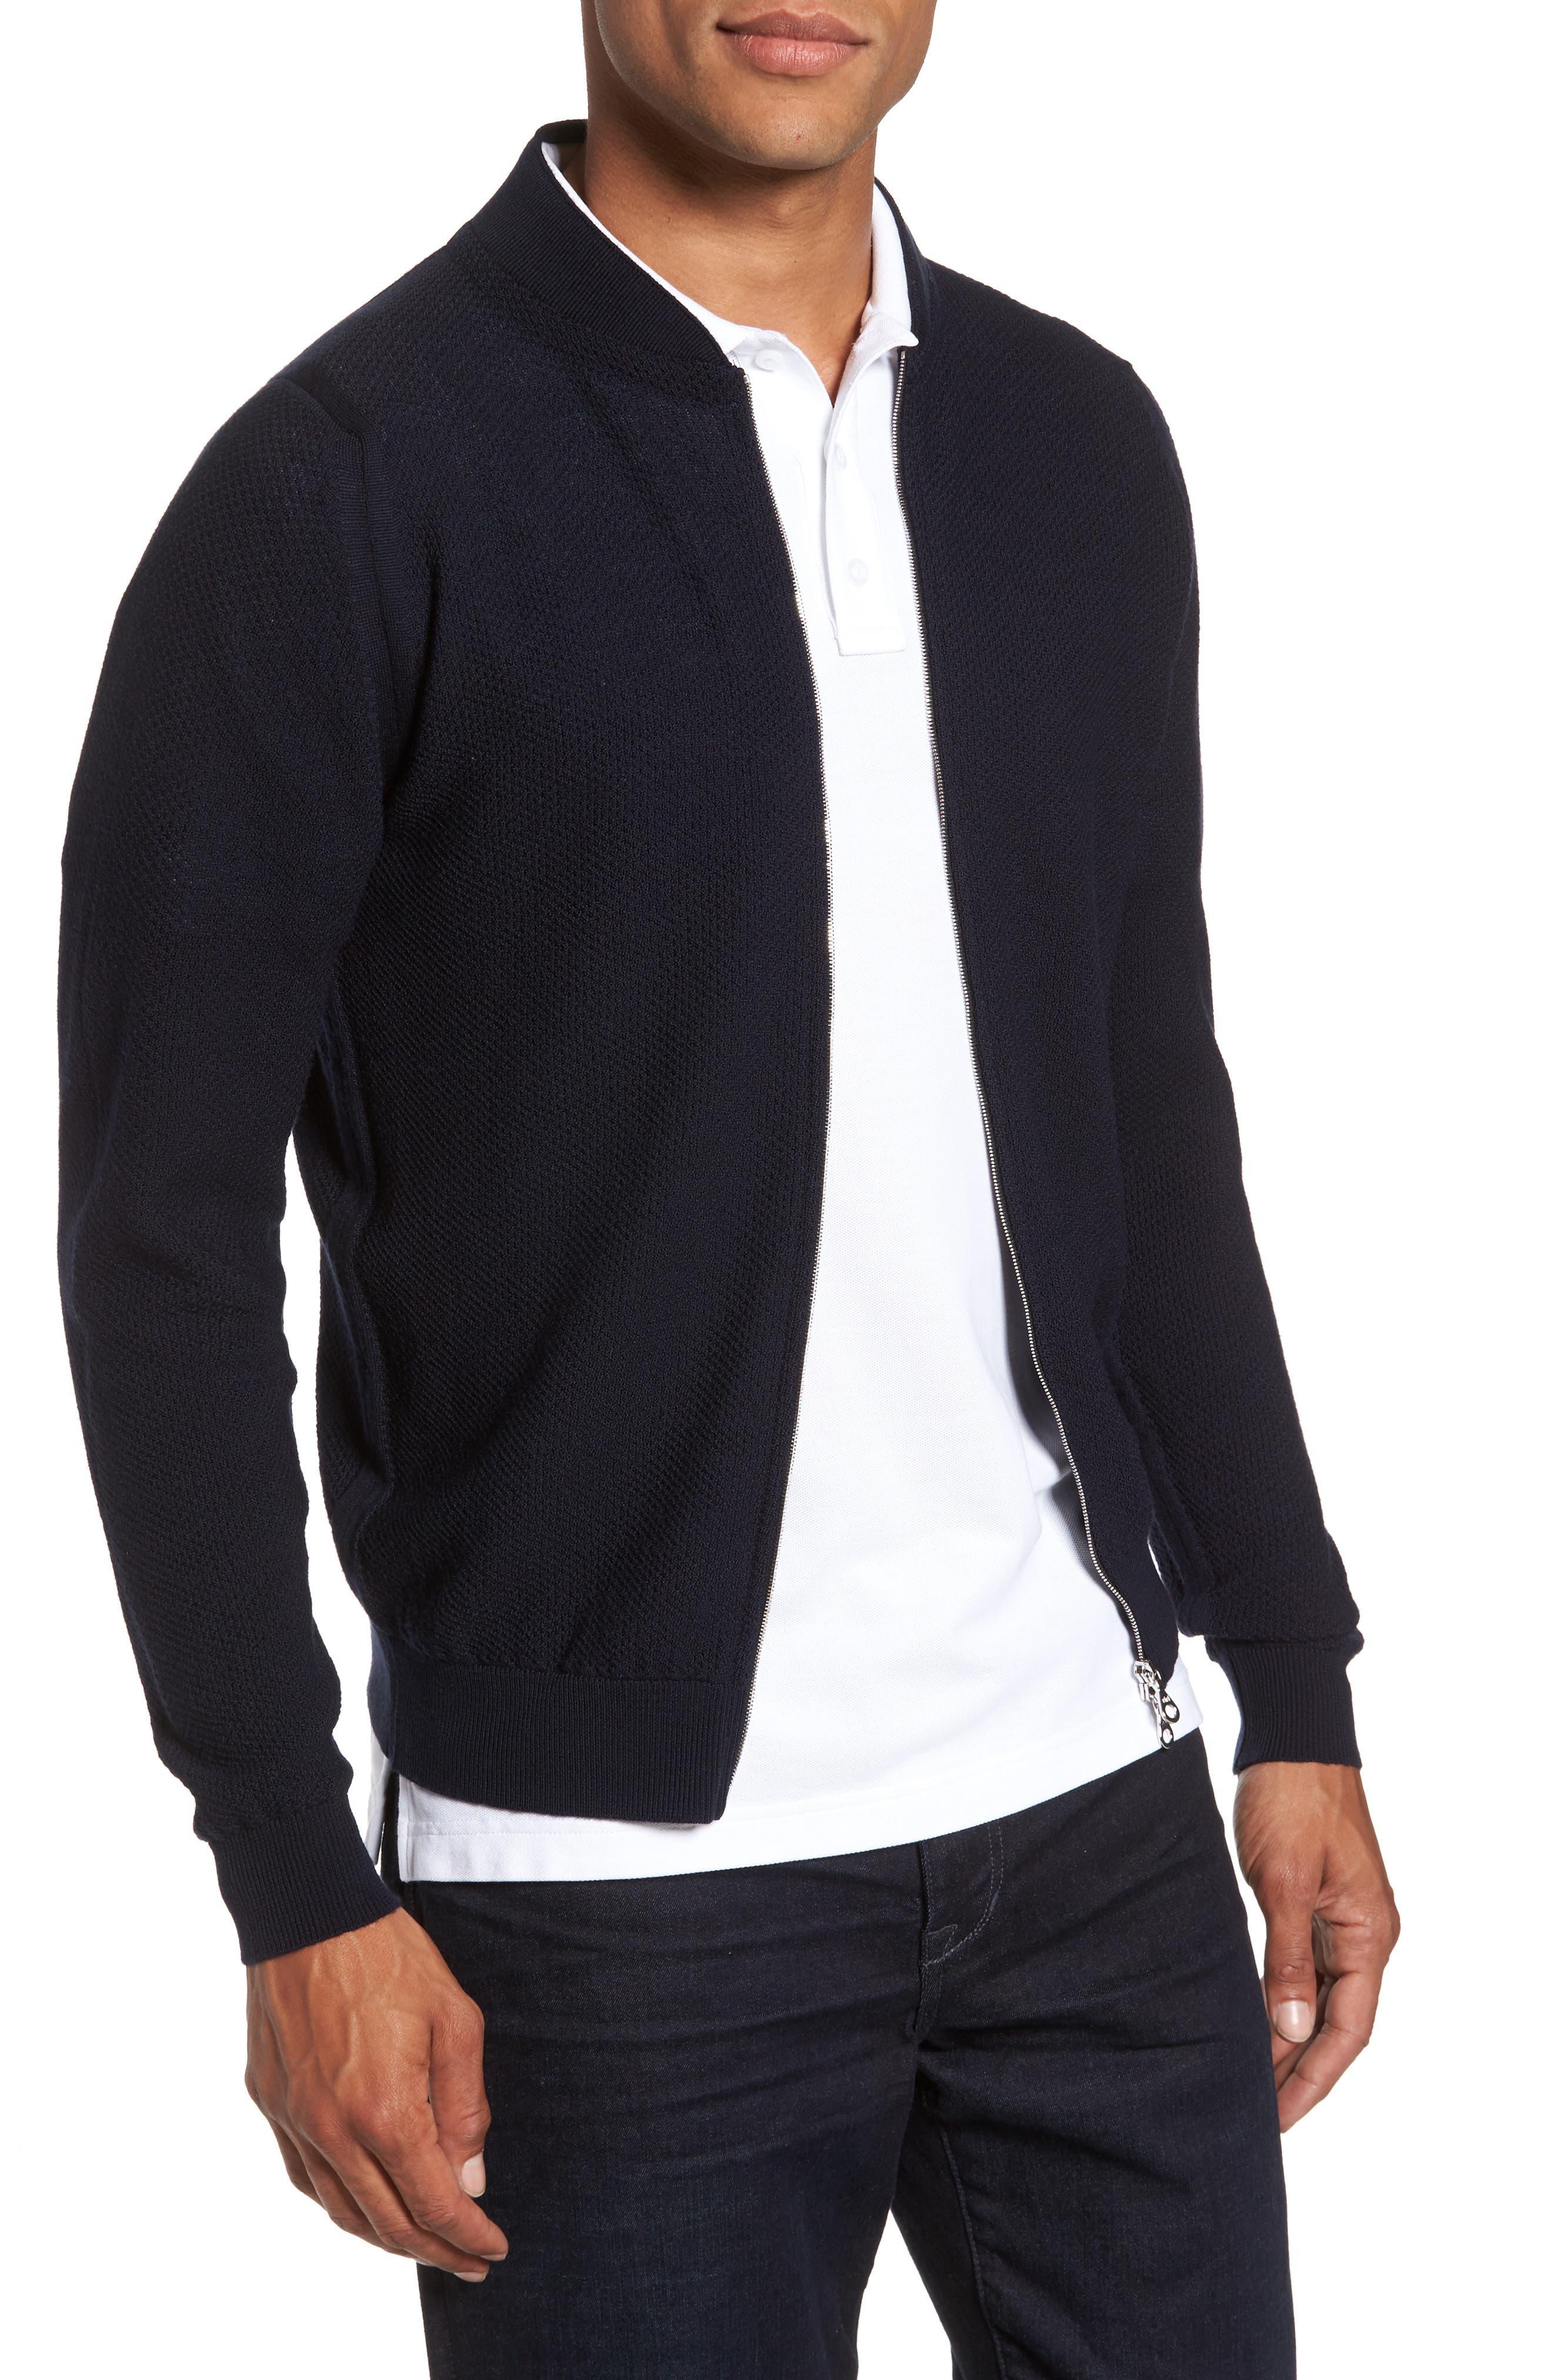 Main Image - John Smedley Standard Fit Merino Wool Knit Jacket